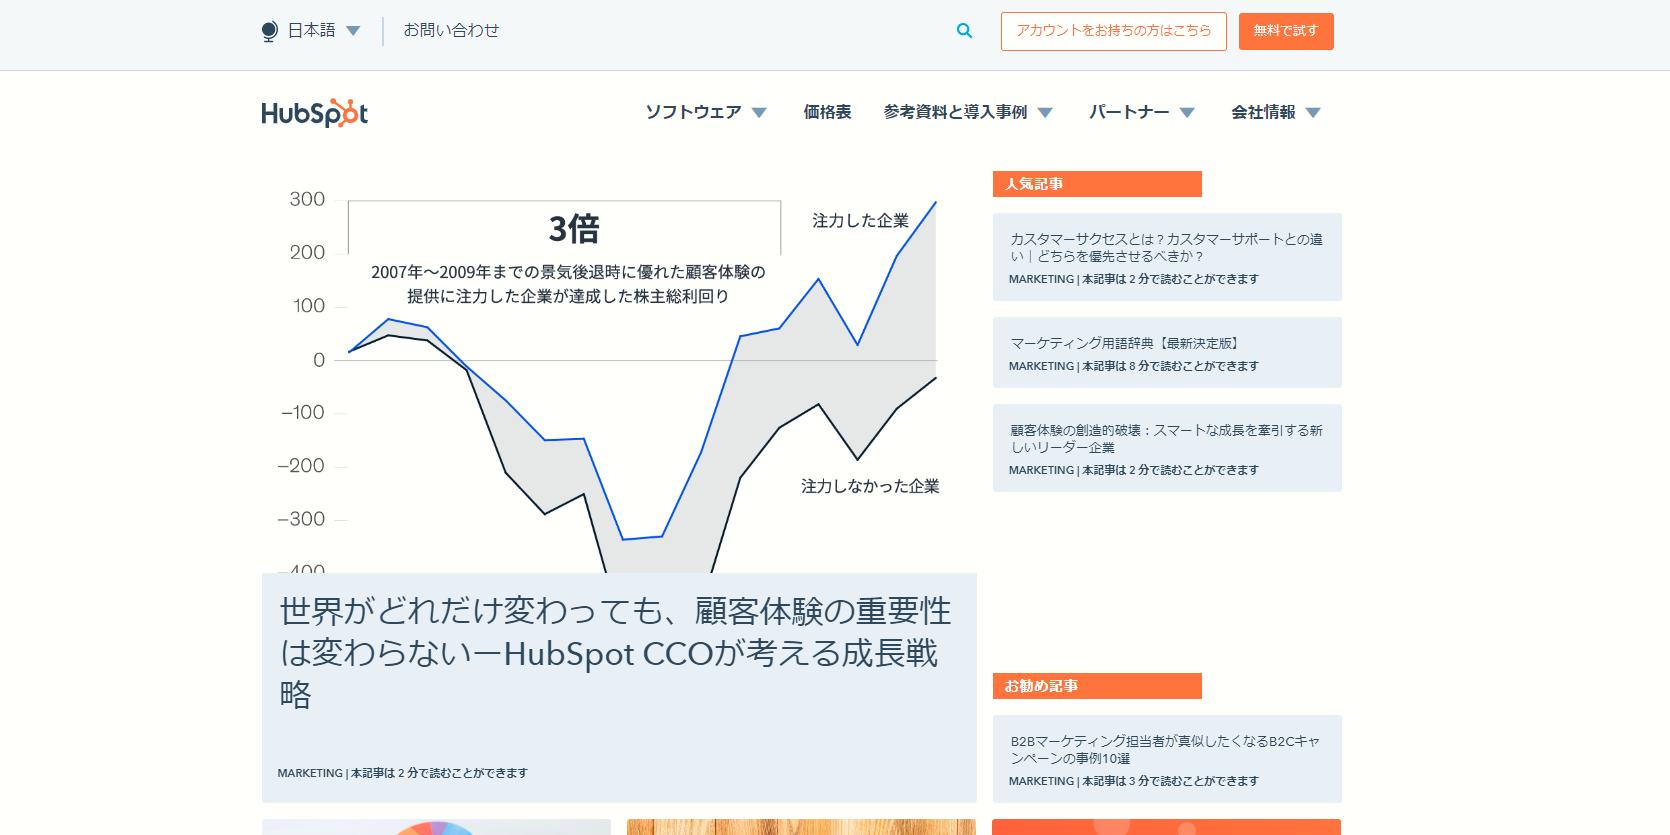 「HubSpotブログ」はリード獲得だけでなく、既存顧客のサポートの役割も兼ねている。